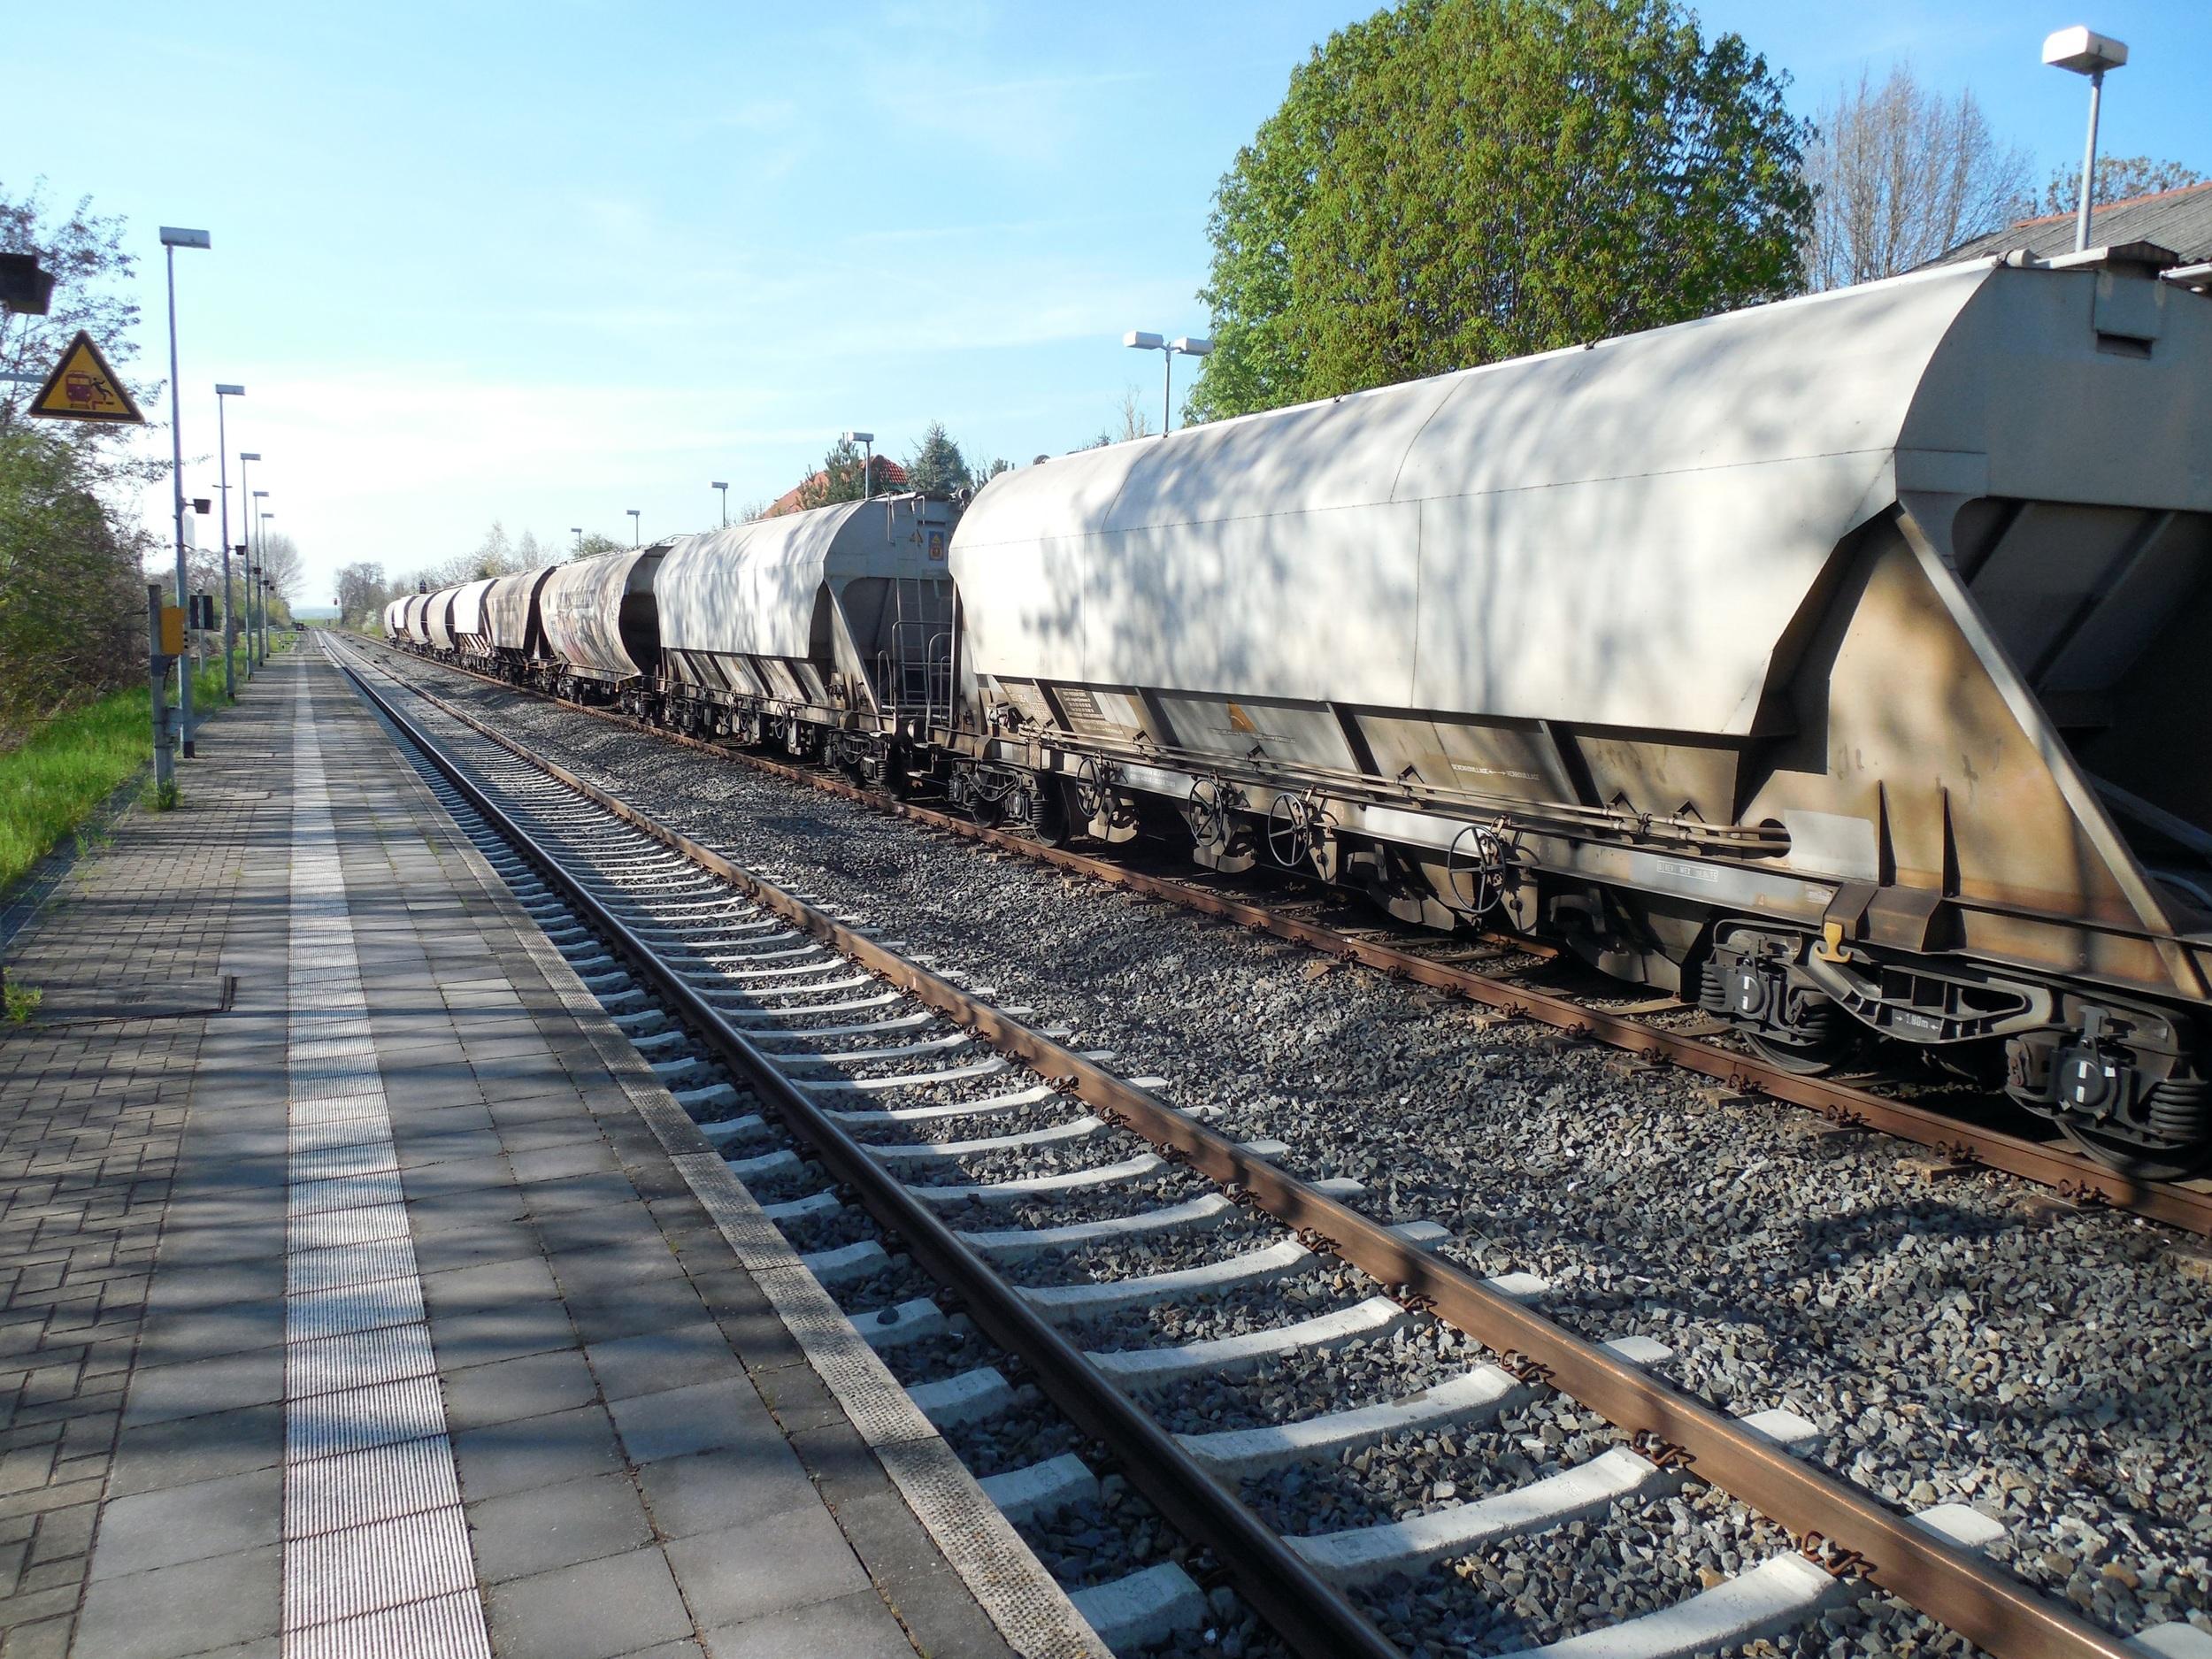 ATS | Services - Railway Transport